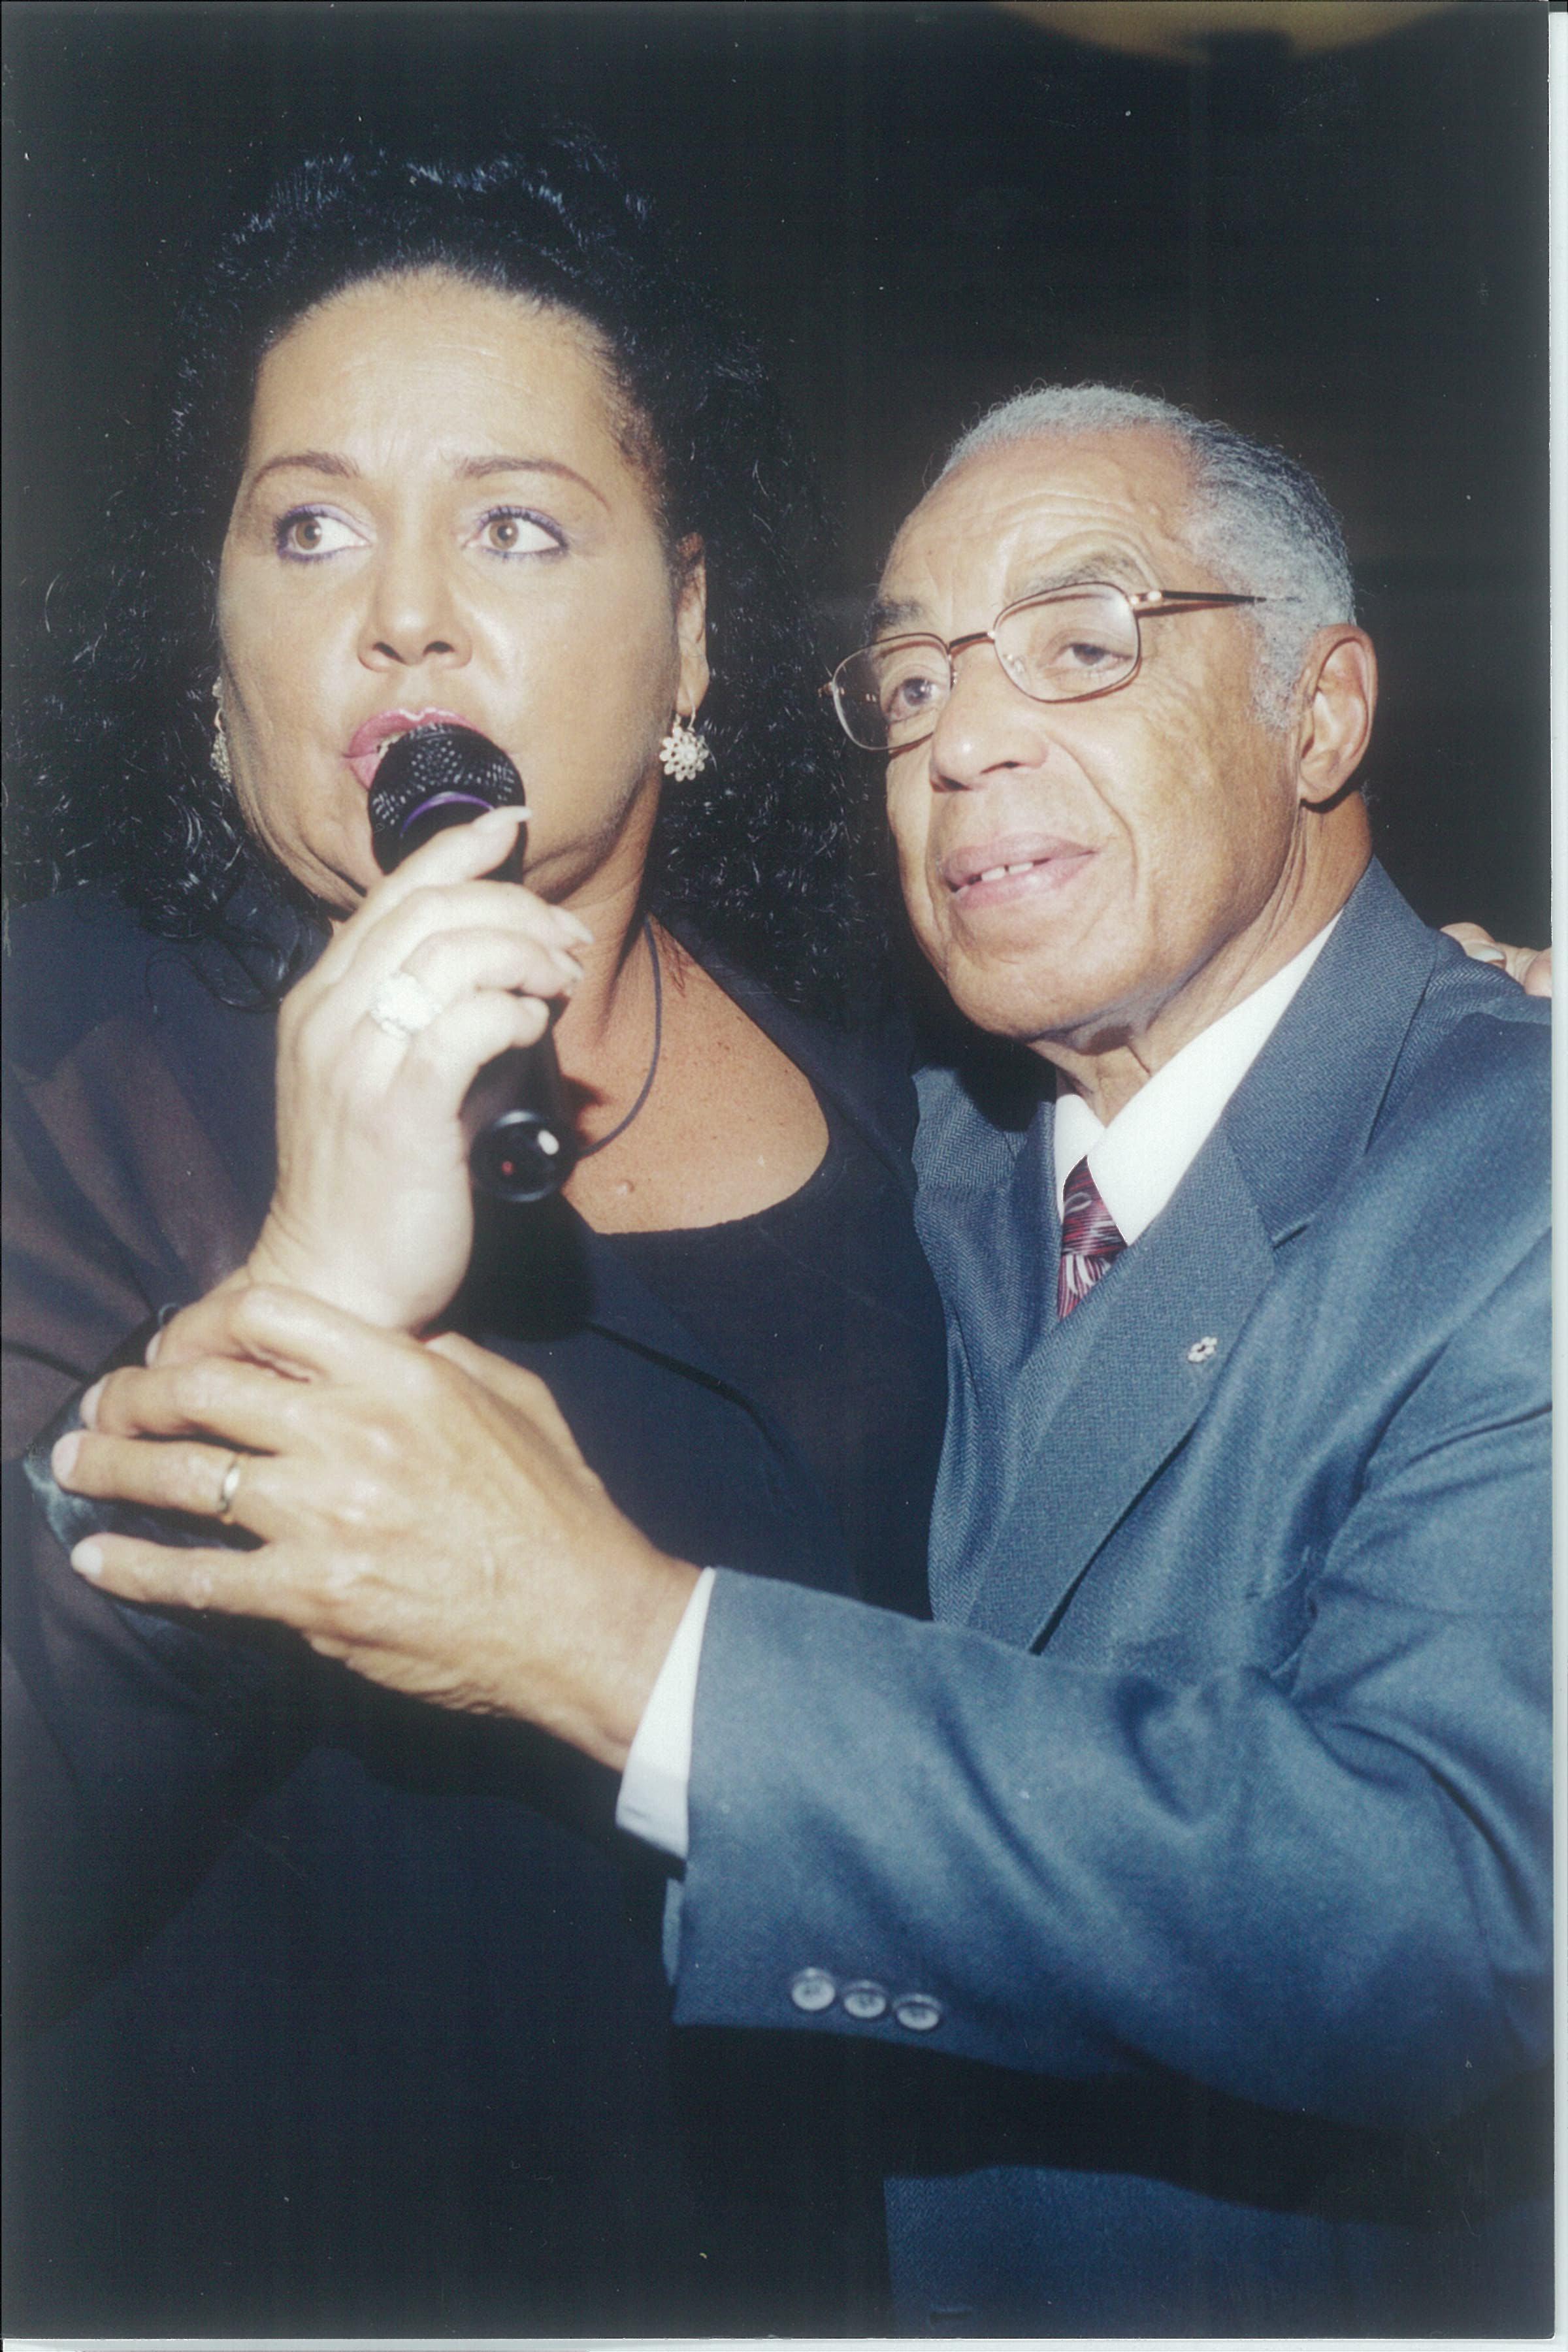 Award-winning singer Liberty Silver serenades Bromley Armstrong at a community event